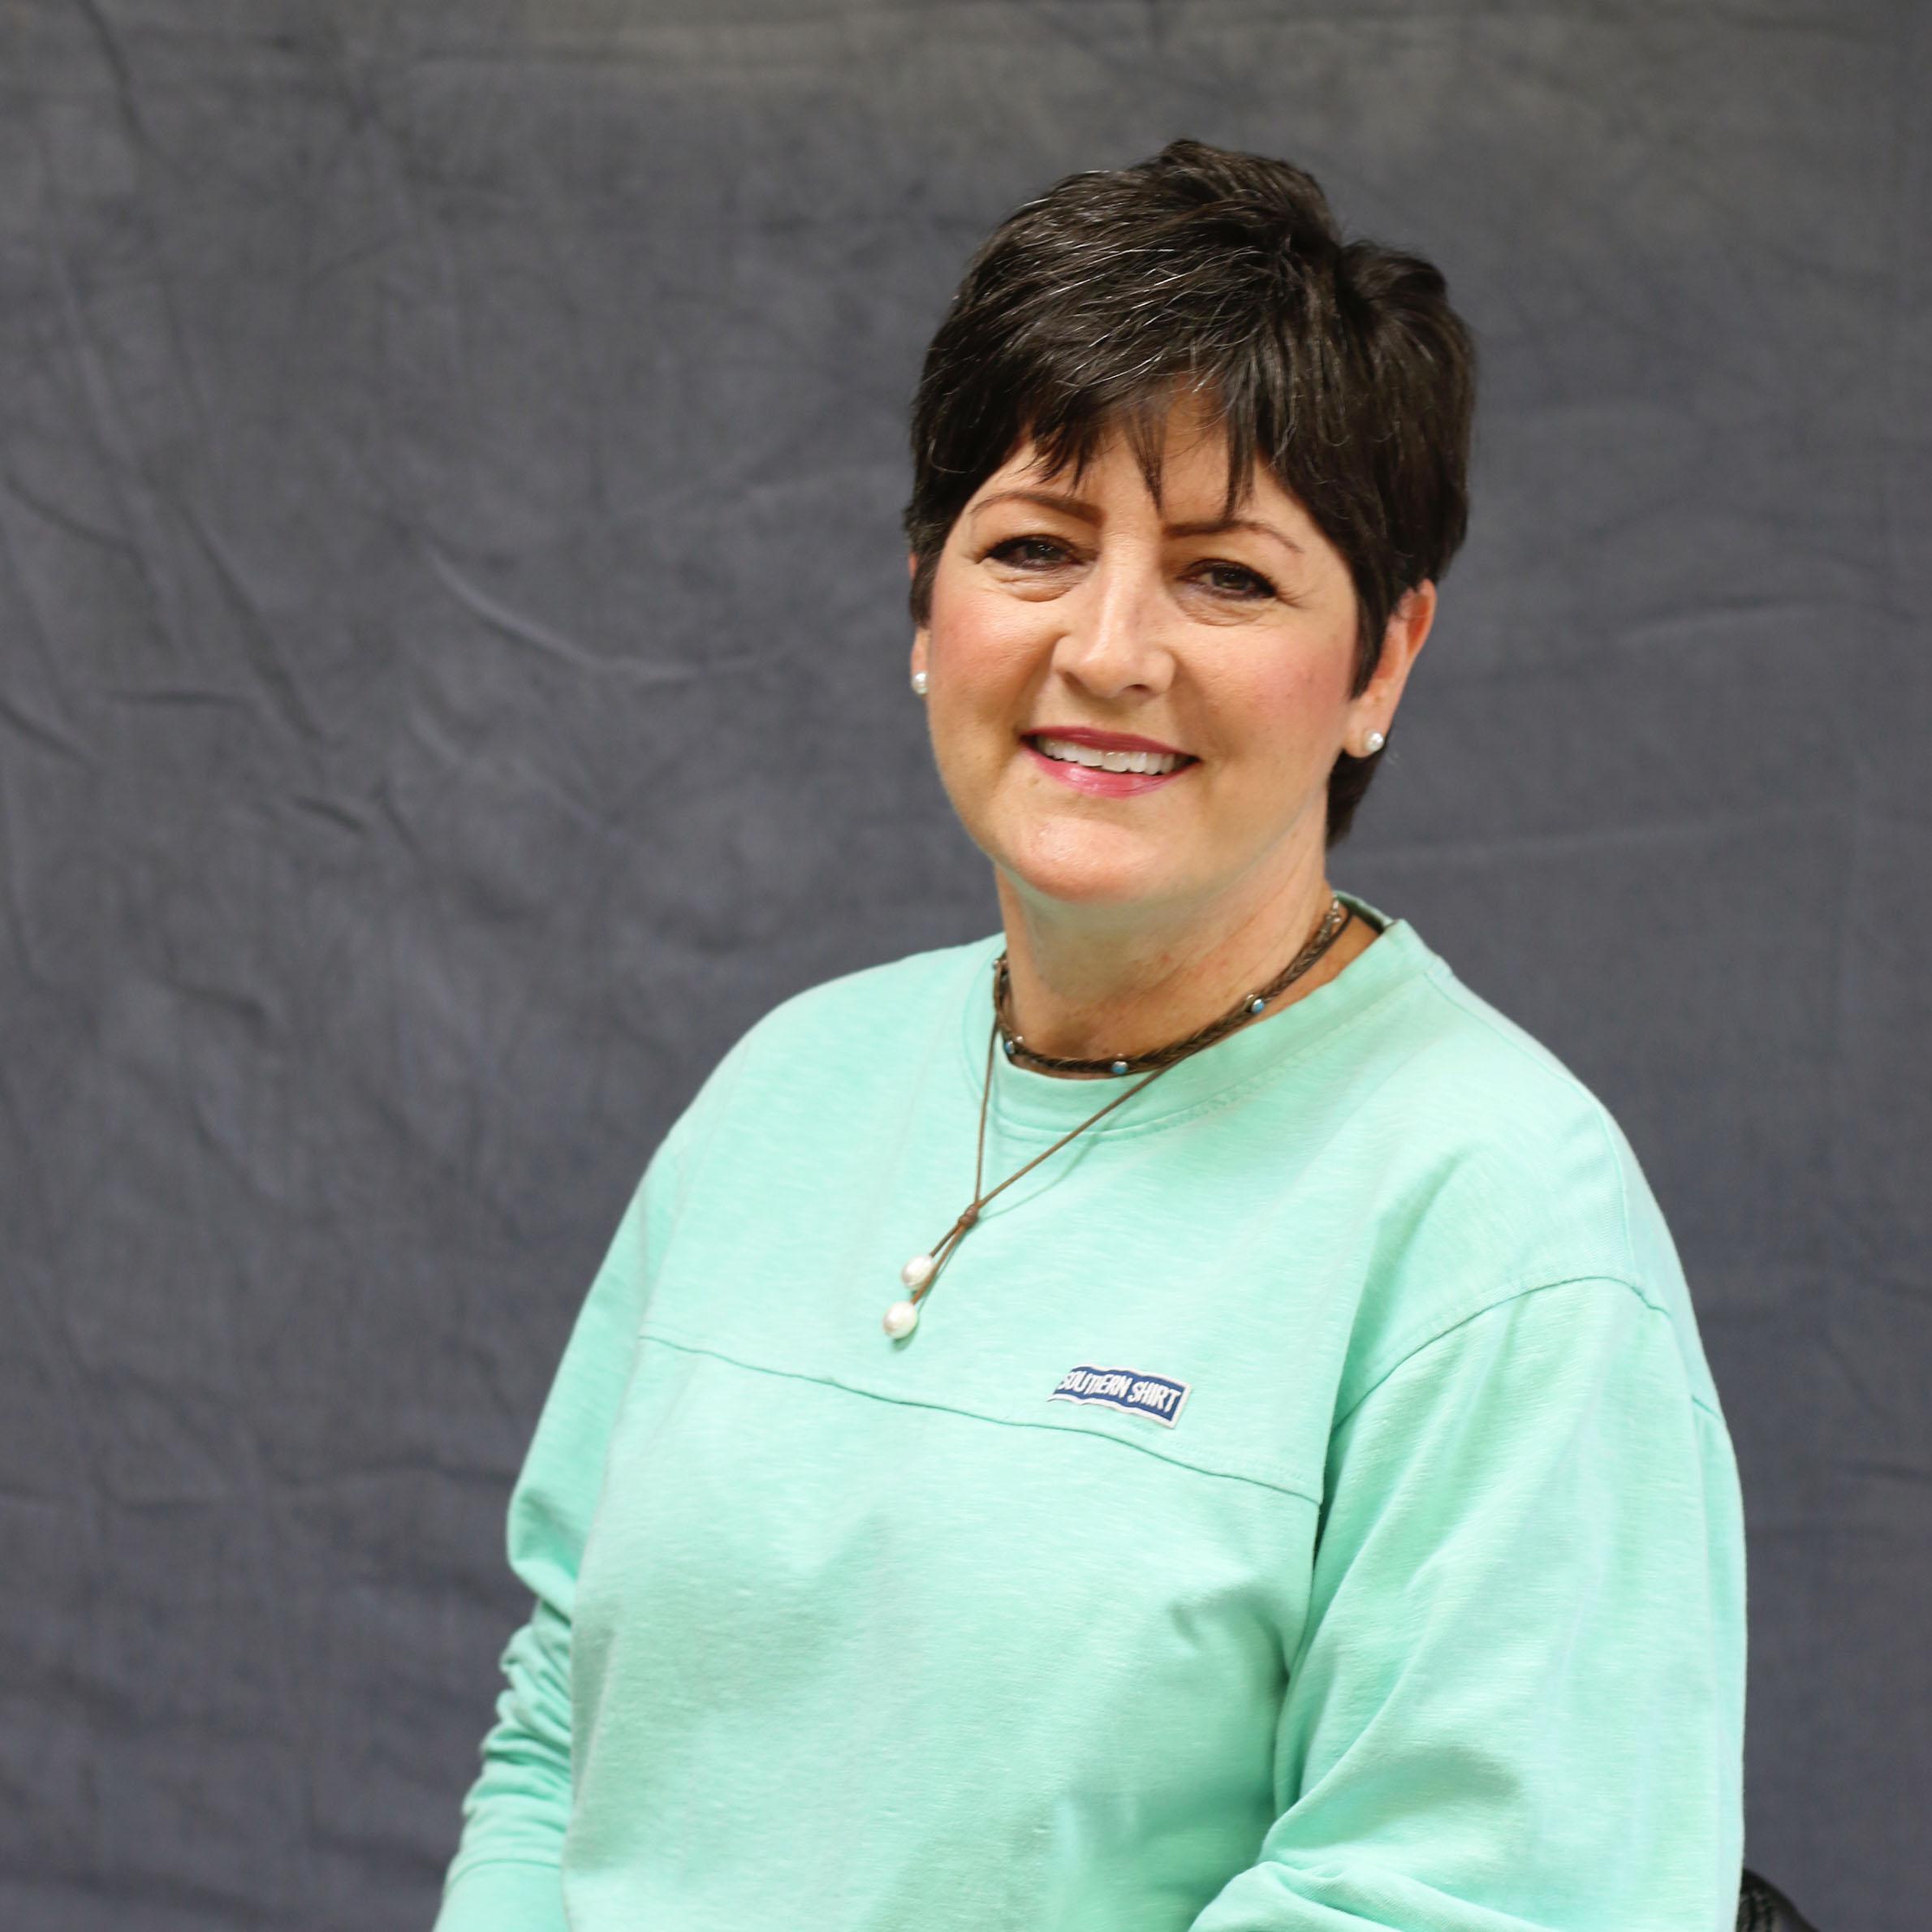 Kim Stinson's Profile Photo